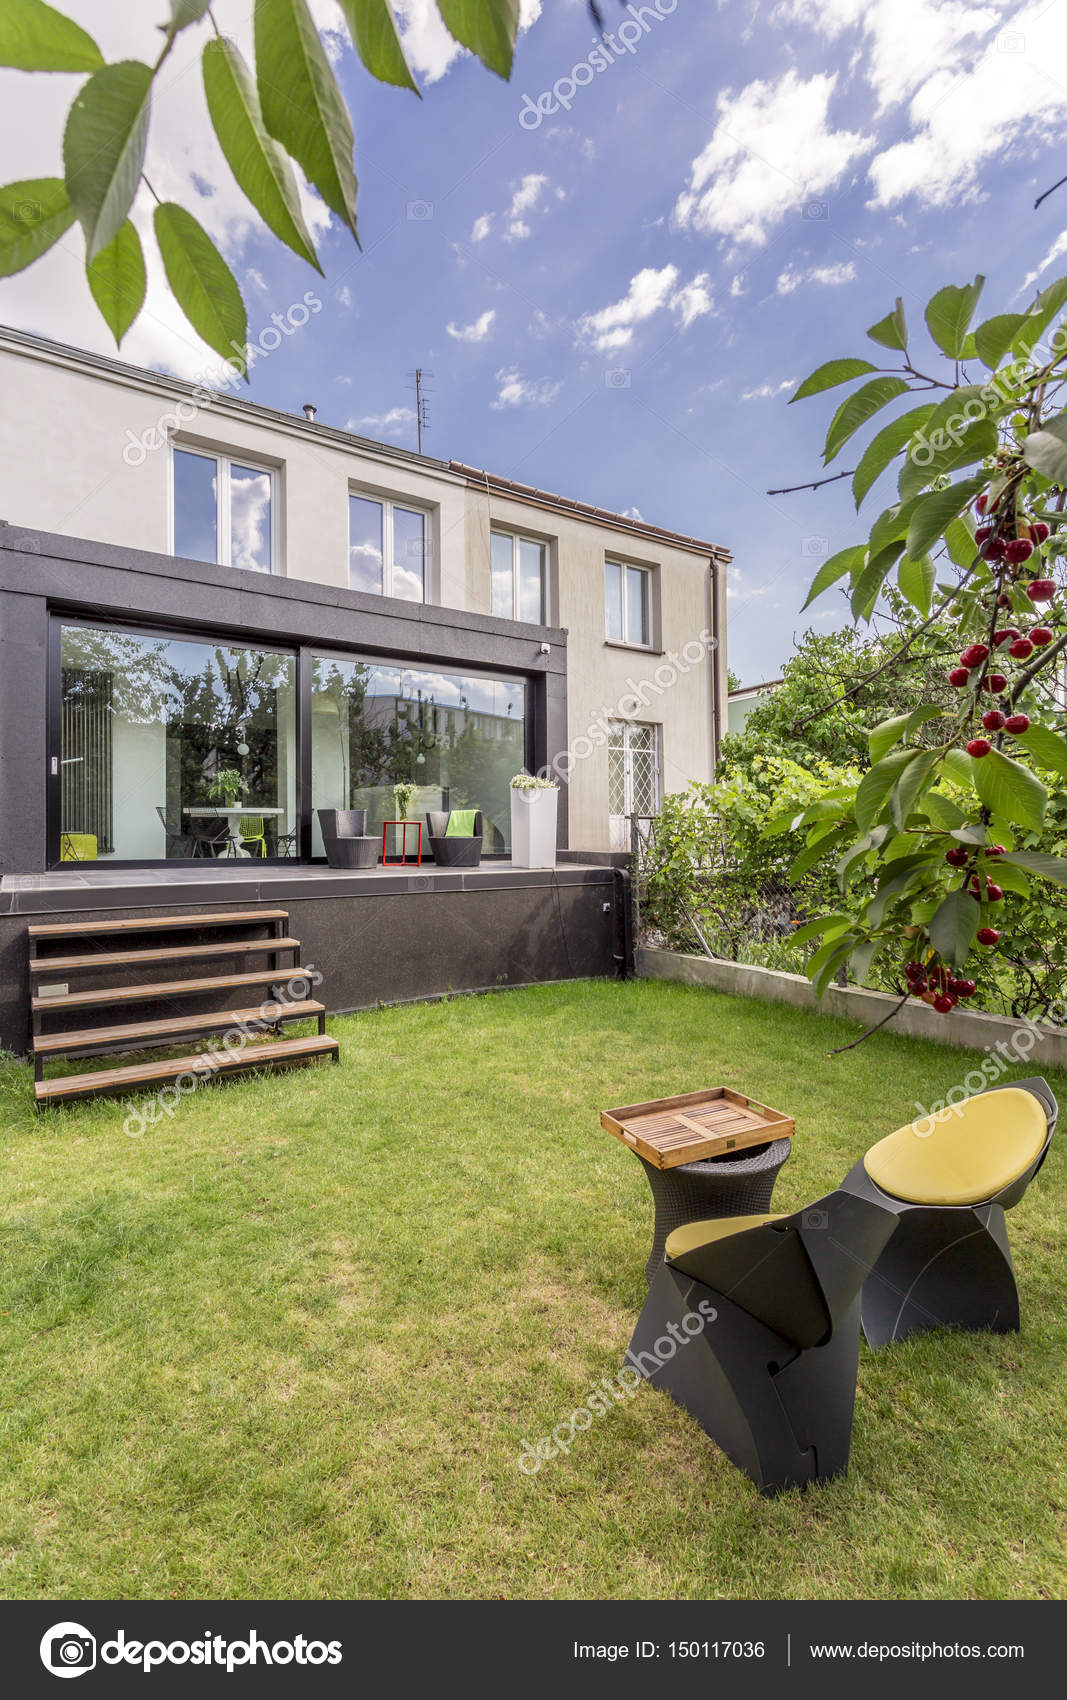 Maison Moderne Avec Jardin Minimaliste Photographie Photographee